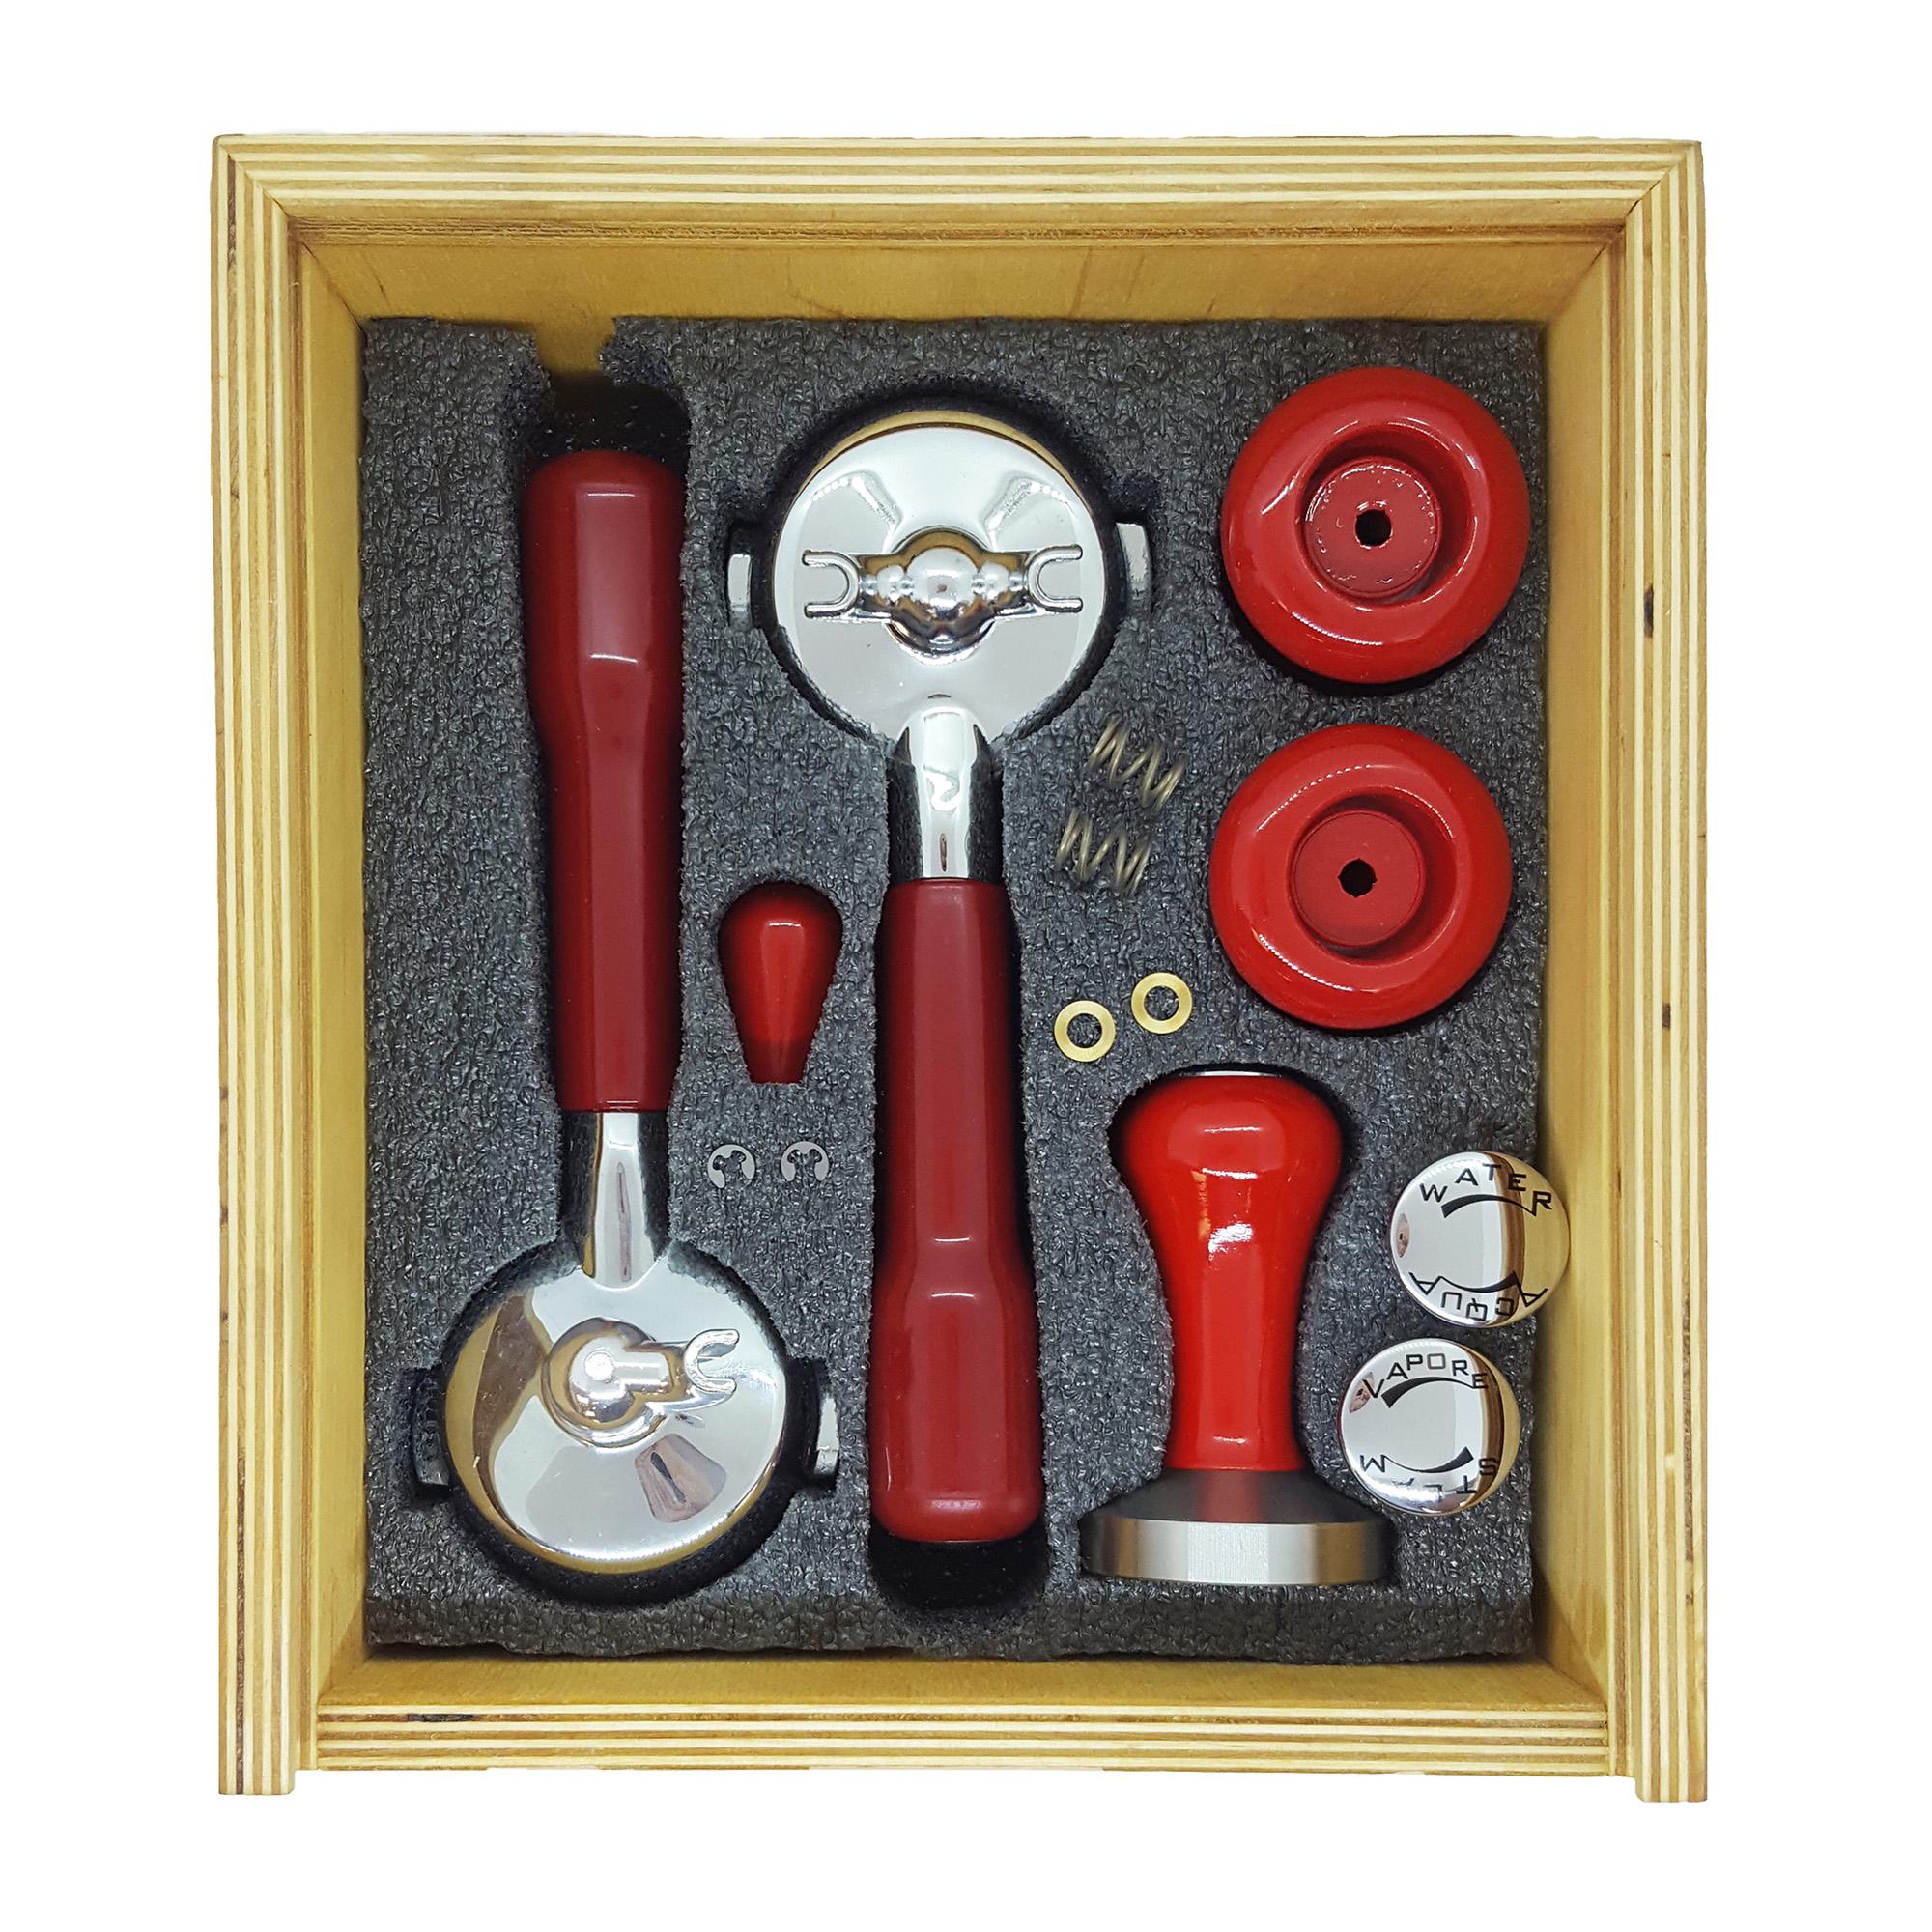 Izzo Knob and Portafilter Accessory Set - Red